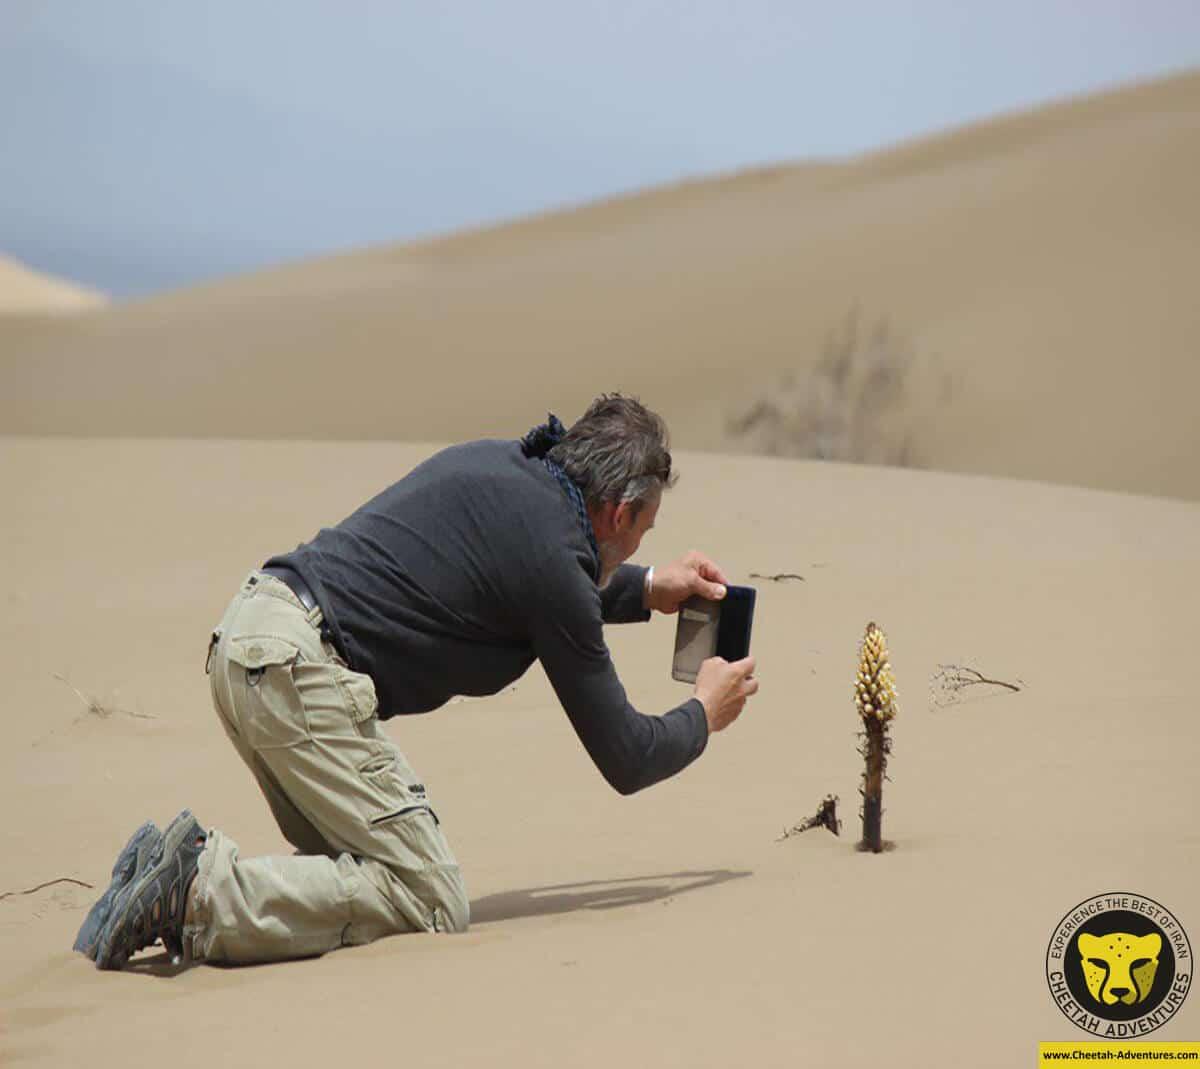 Dasht-e kavir and Dasht-e Lut Desert area of Iran, Desert Tours